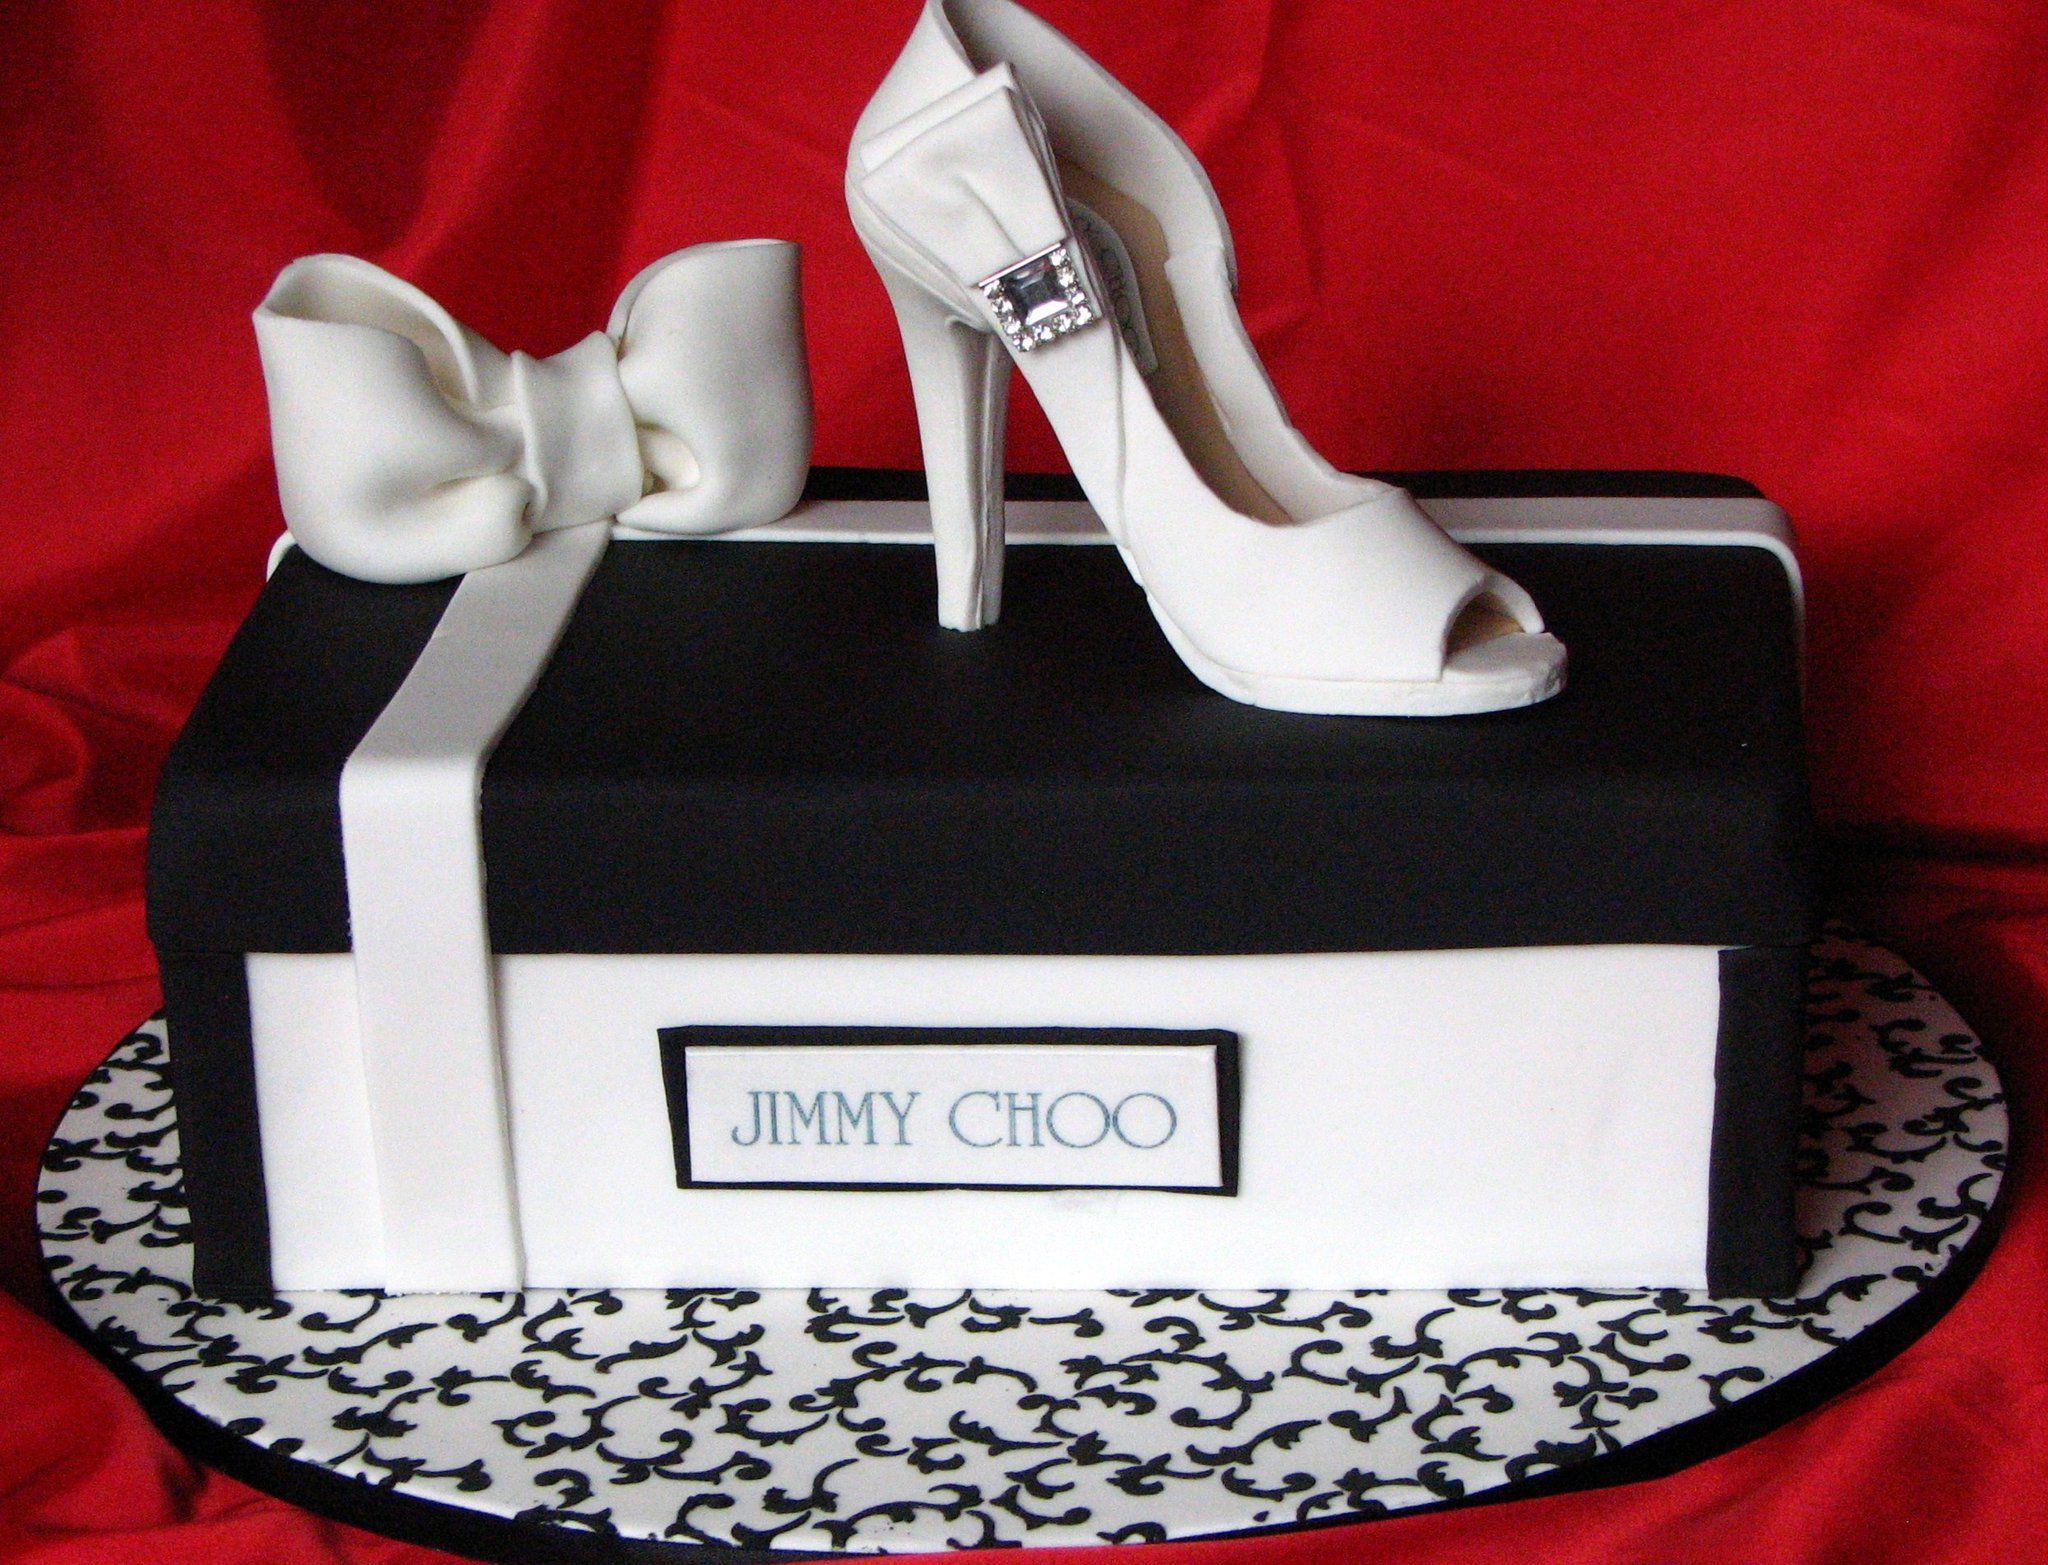 shoe box cake designs - Google Search